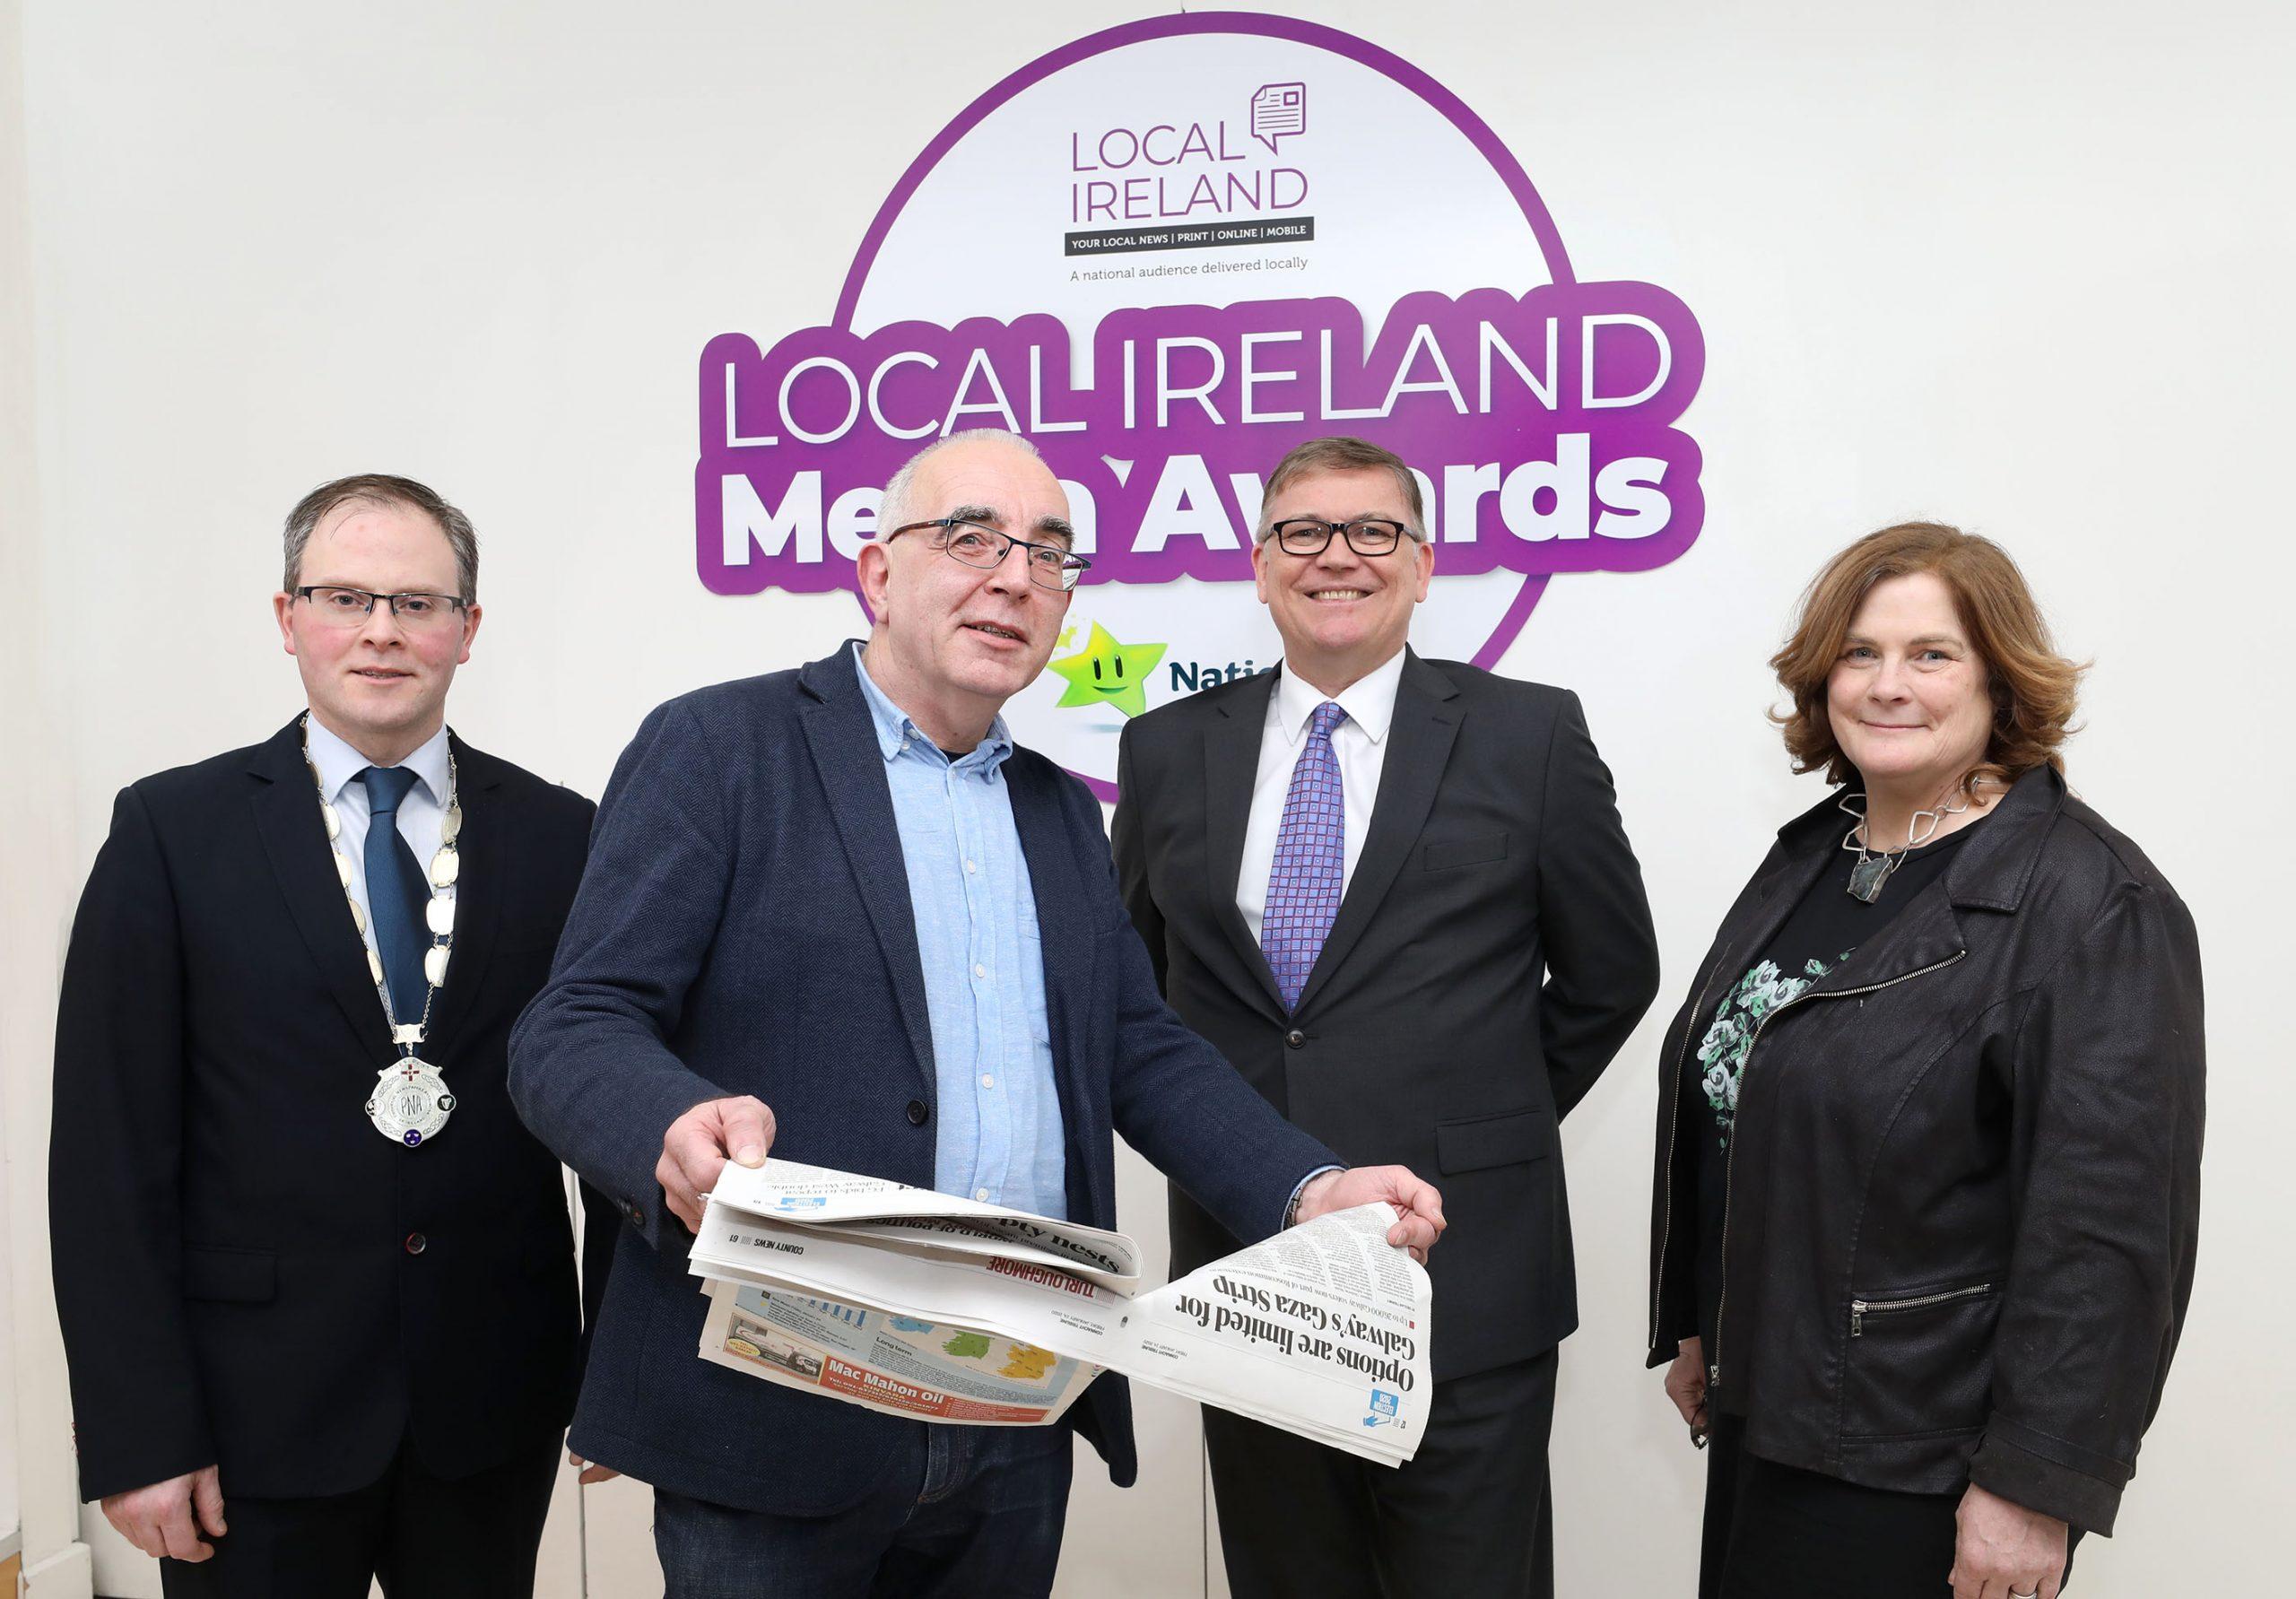 Local Ireland Media Awards Video